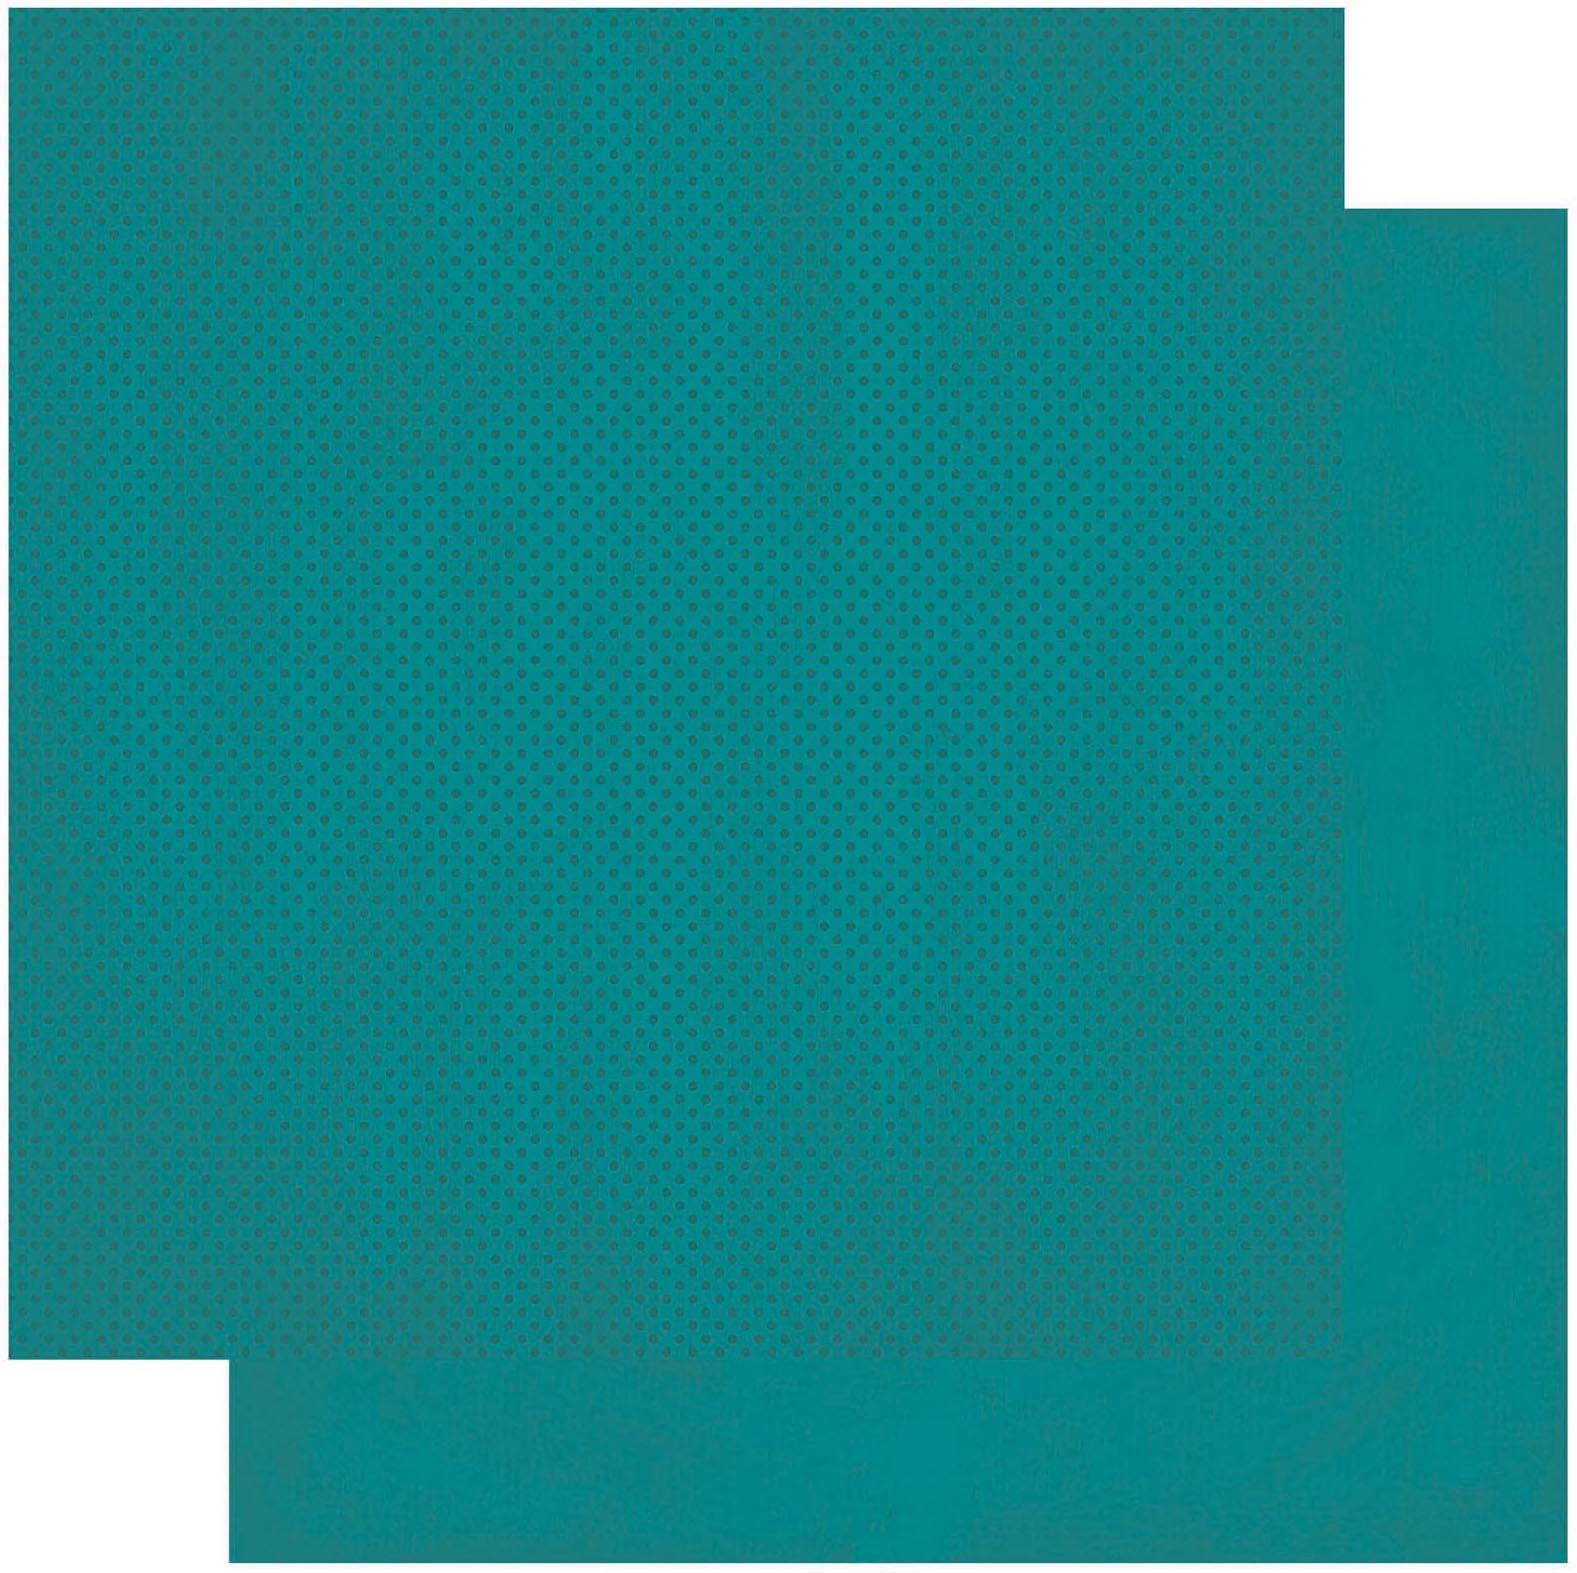 BoBunny Double Dot Double-Sided Textured Cardstock 12X12-Deep Sea